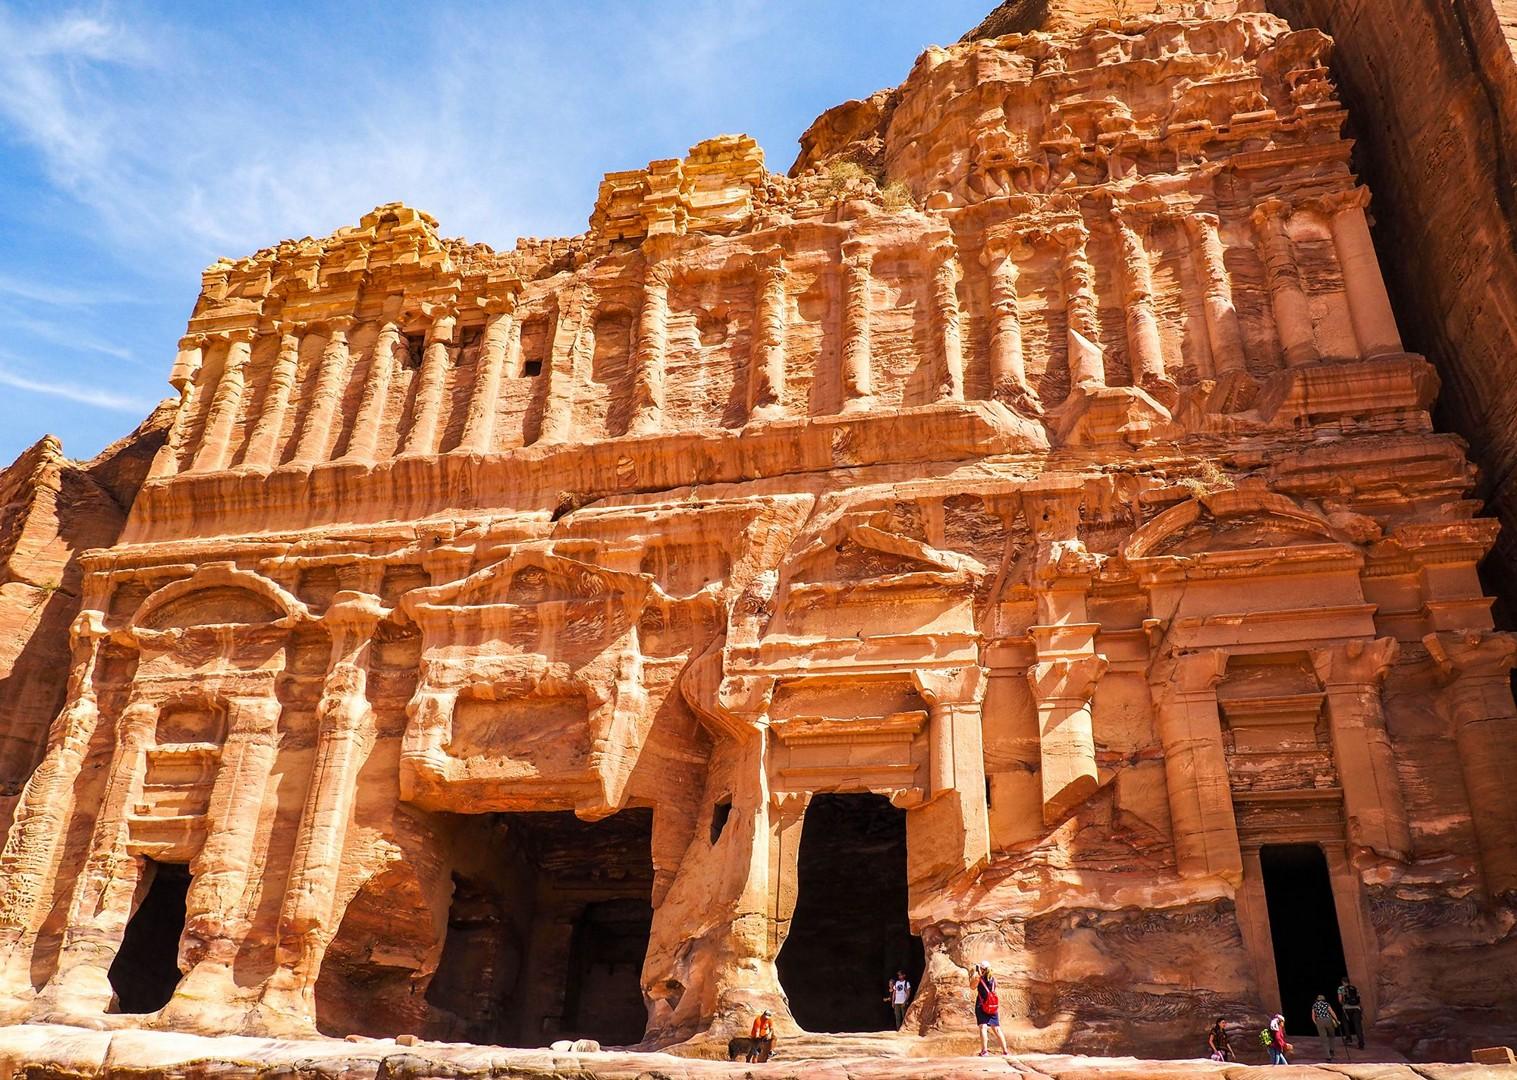 petra-jordan-holiday-cycling-adventures-saddle-skedaddle-trip.jpg - NEW! Jordan - Petra, Wadi Rum & the Dead Sea - Cycling Adventures